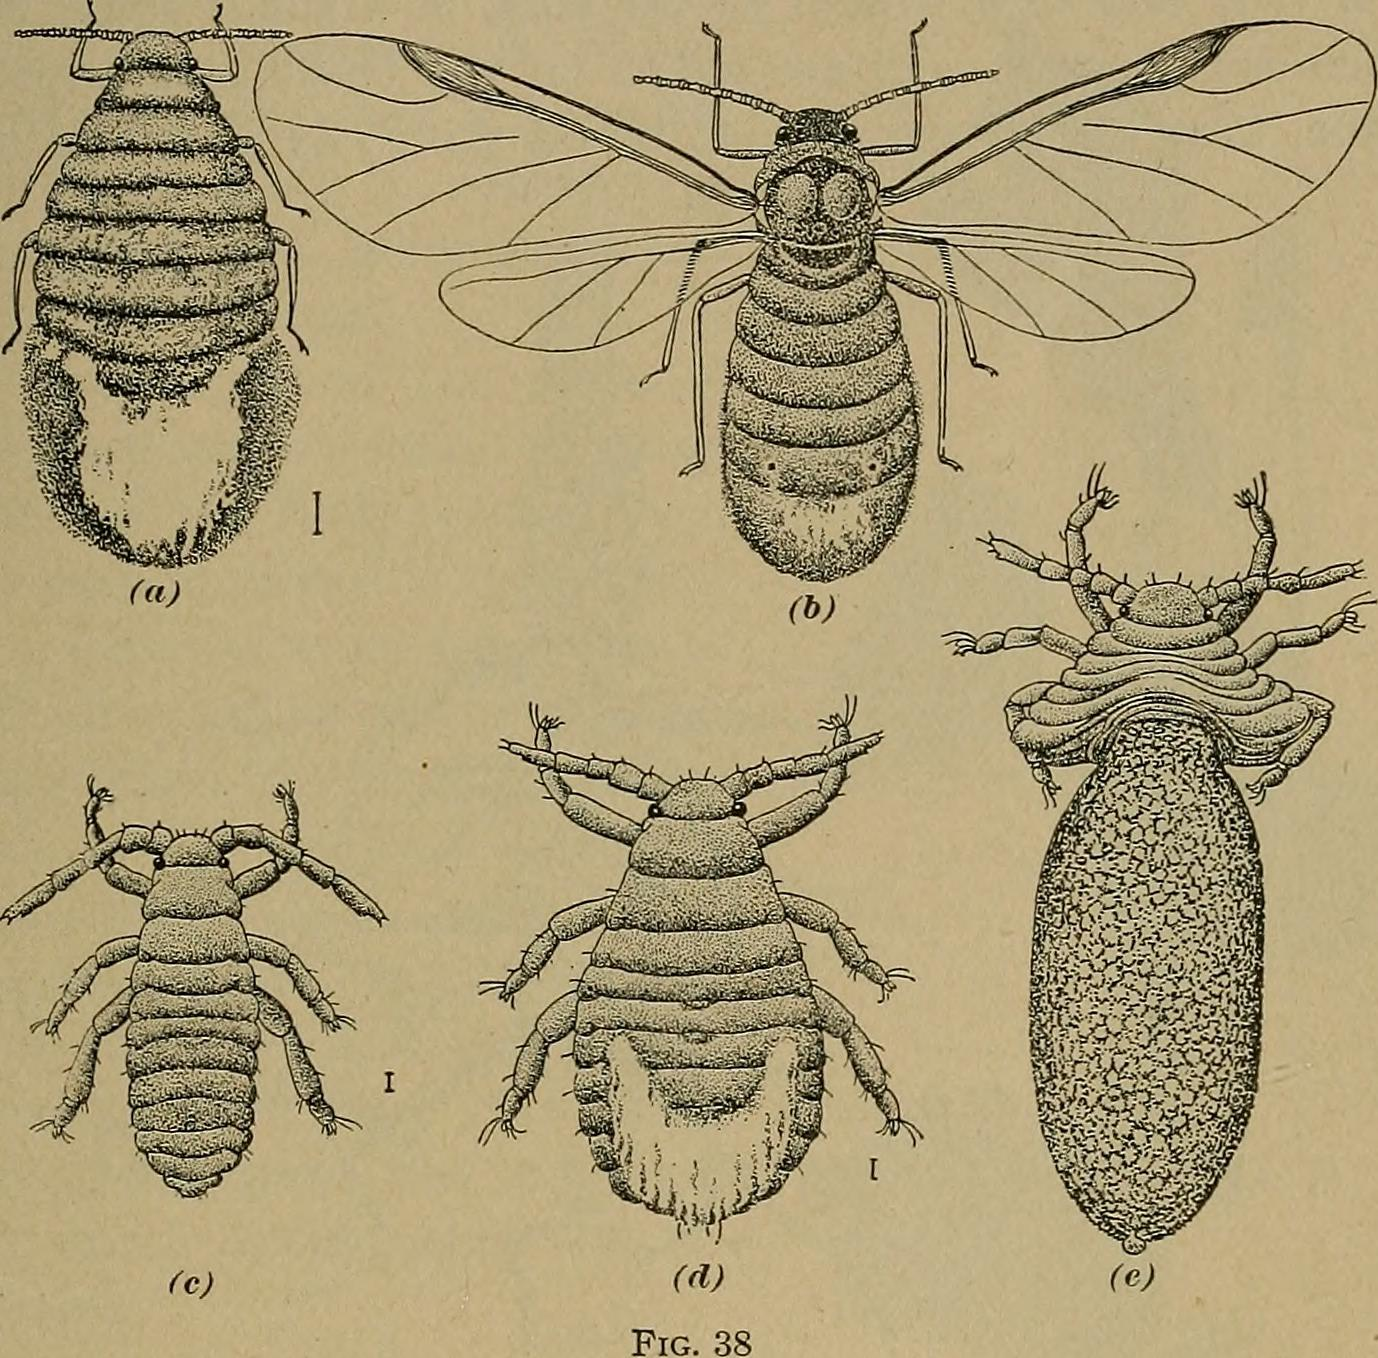 File:Fruit culture (1912) (14782031622) jpg - Wikimedia Commons